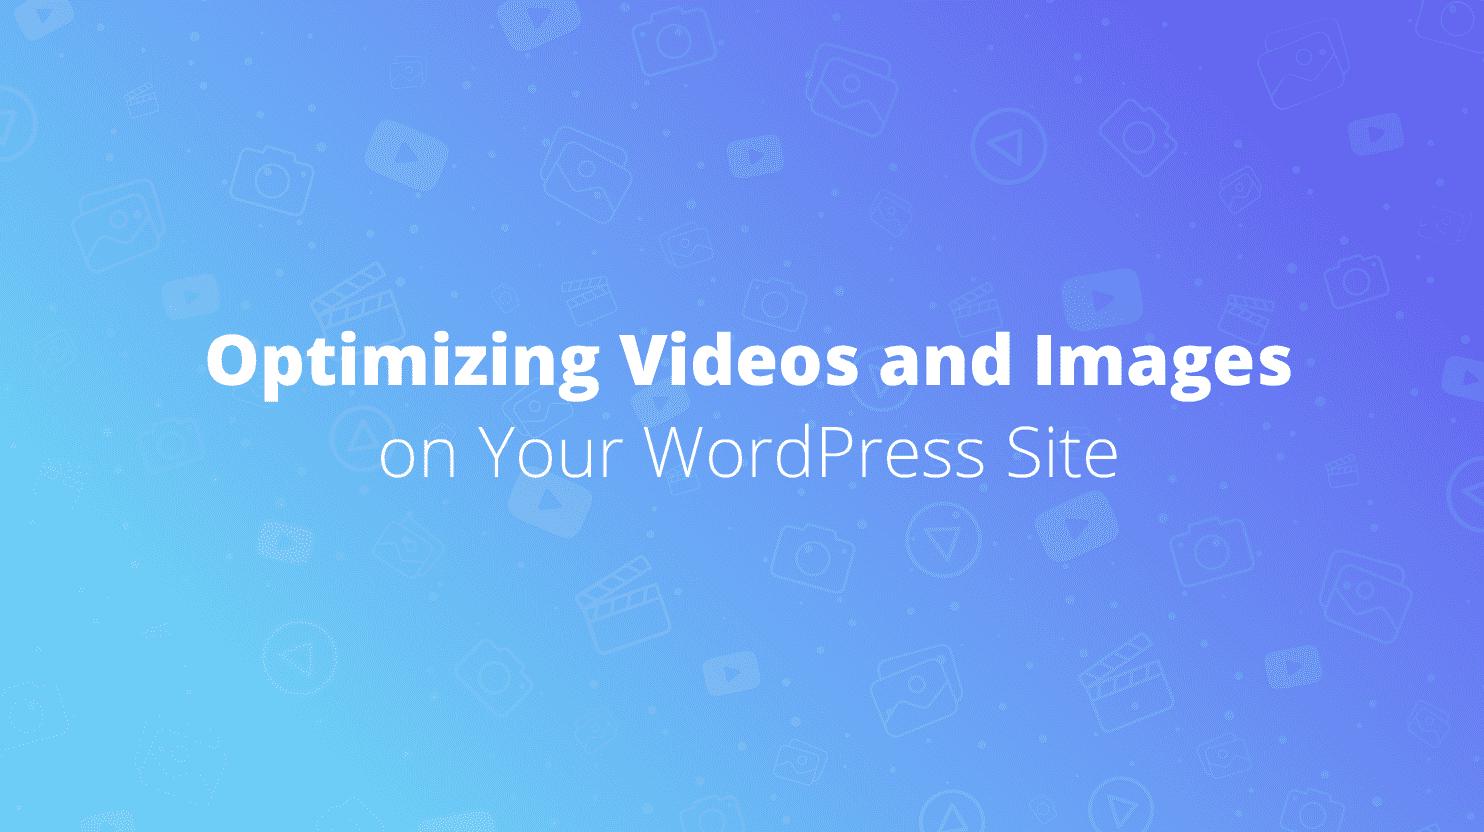 optimize-video-image-wordpress-banner